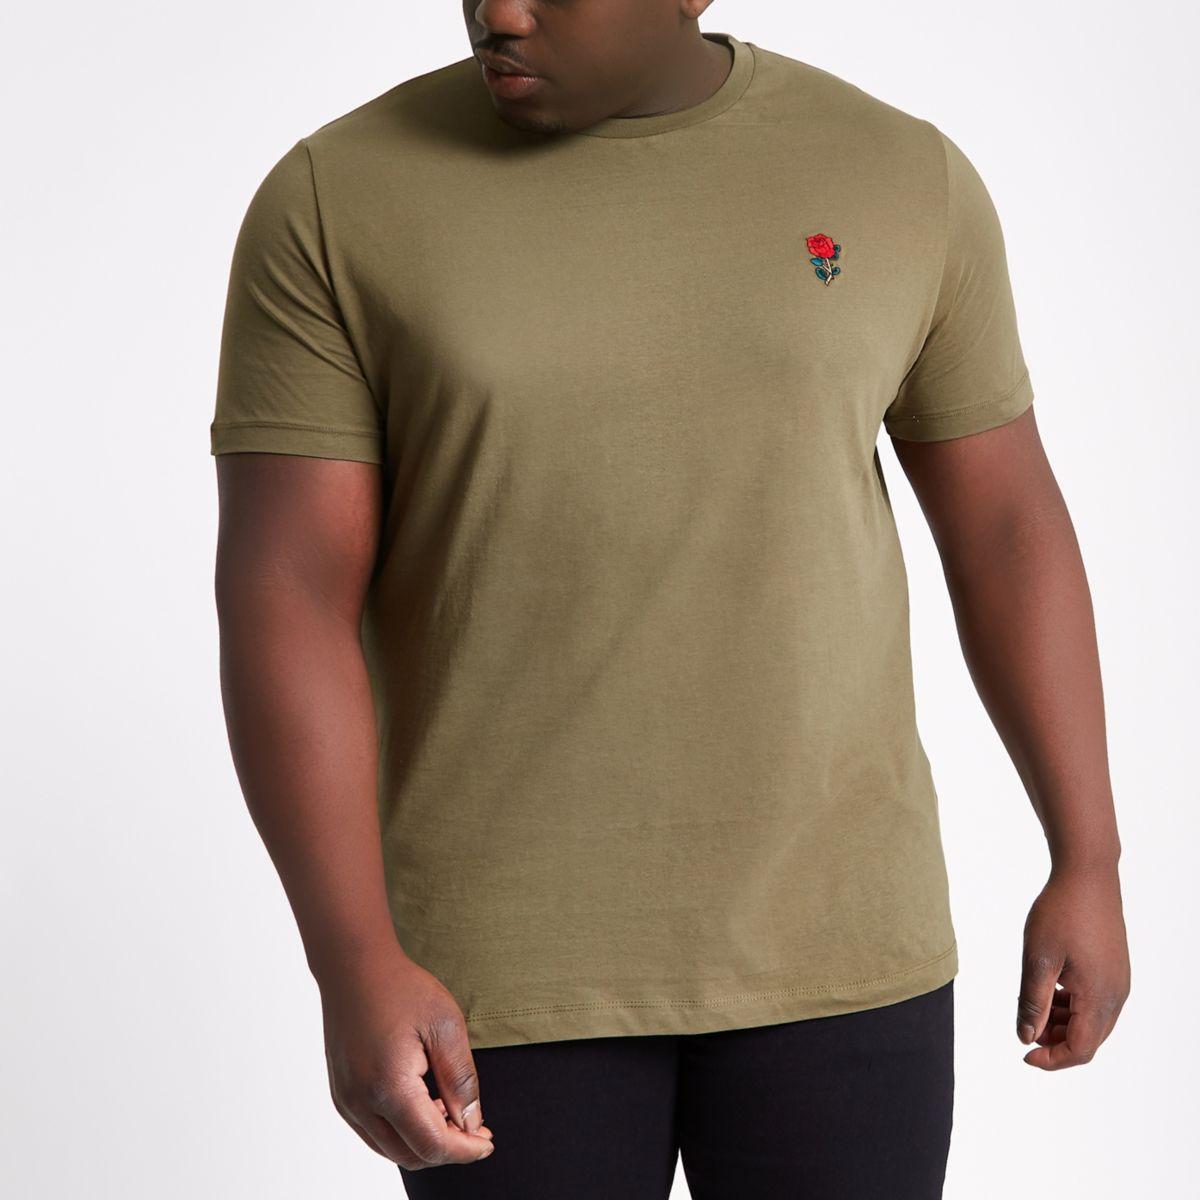 Big & Tall – T-shirt vert foncé brodé